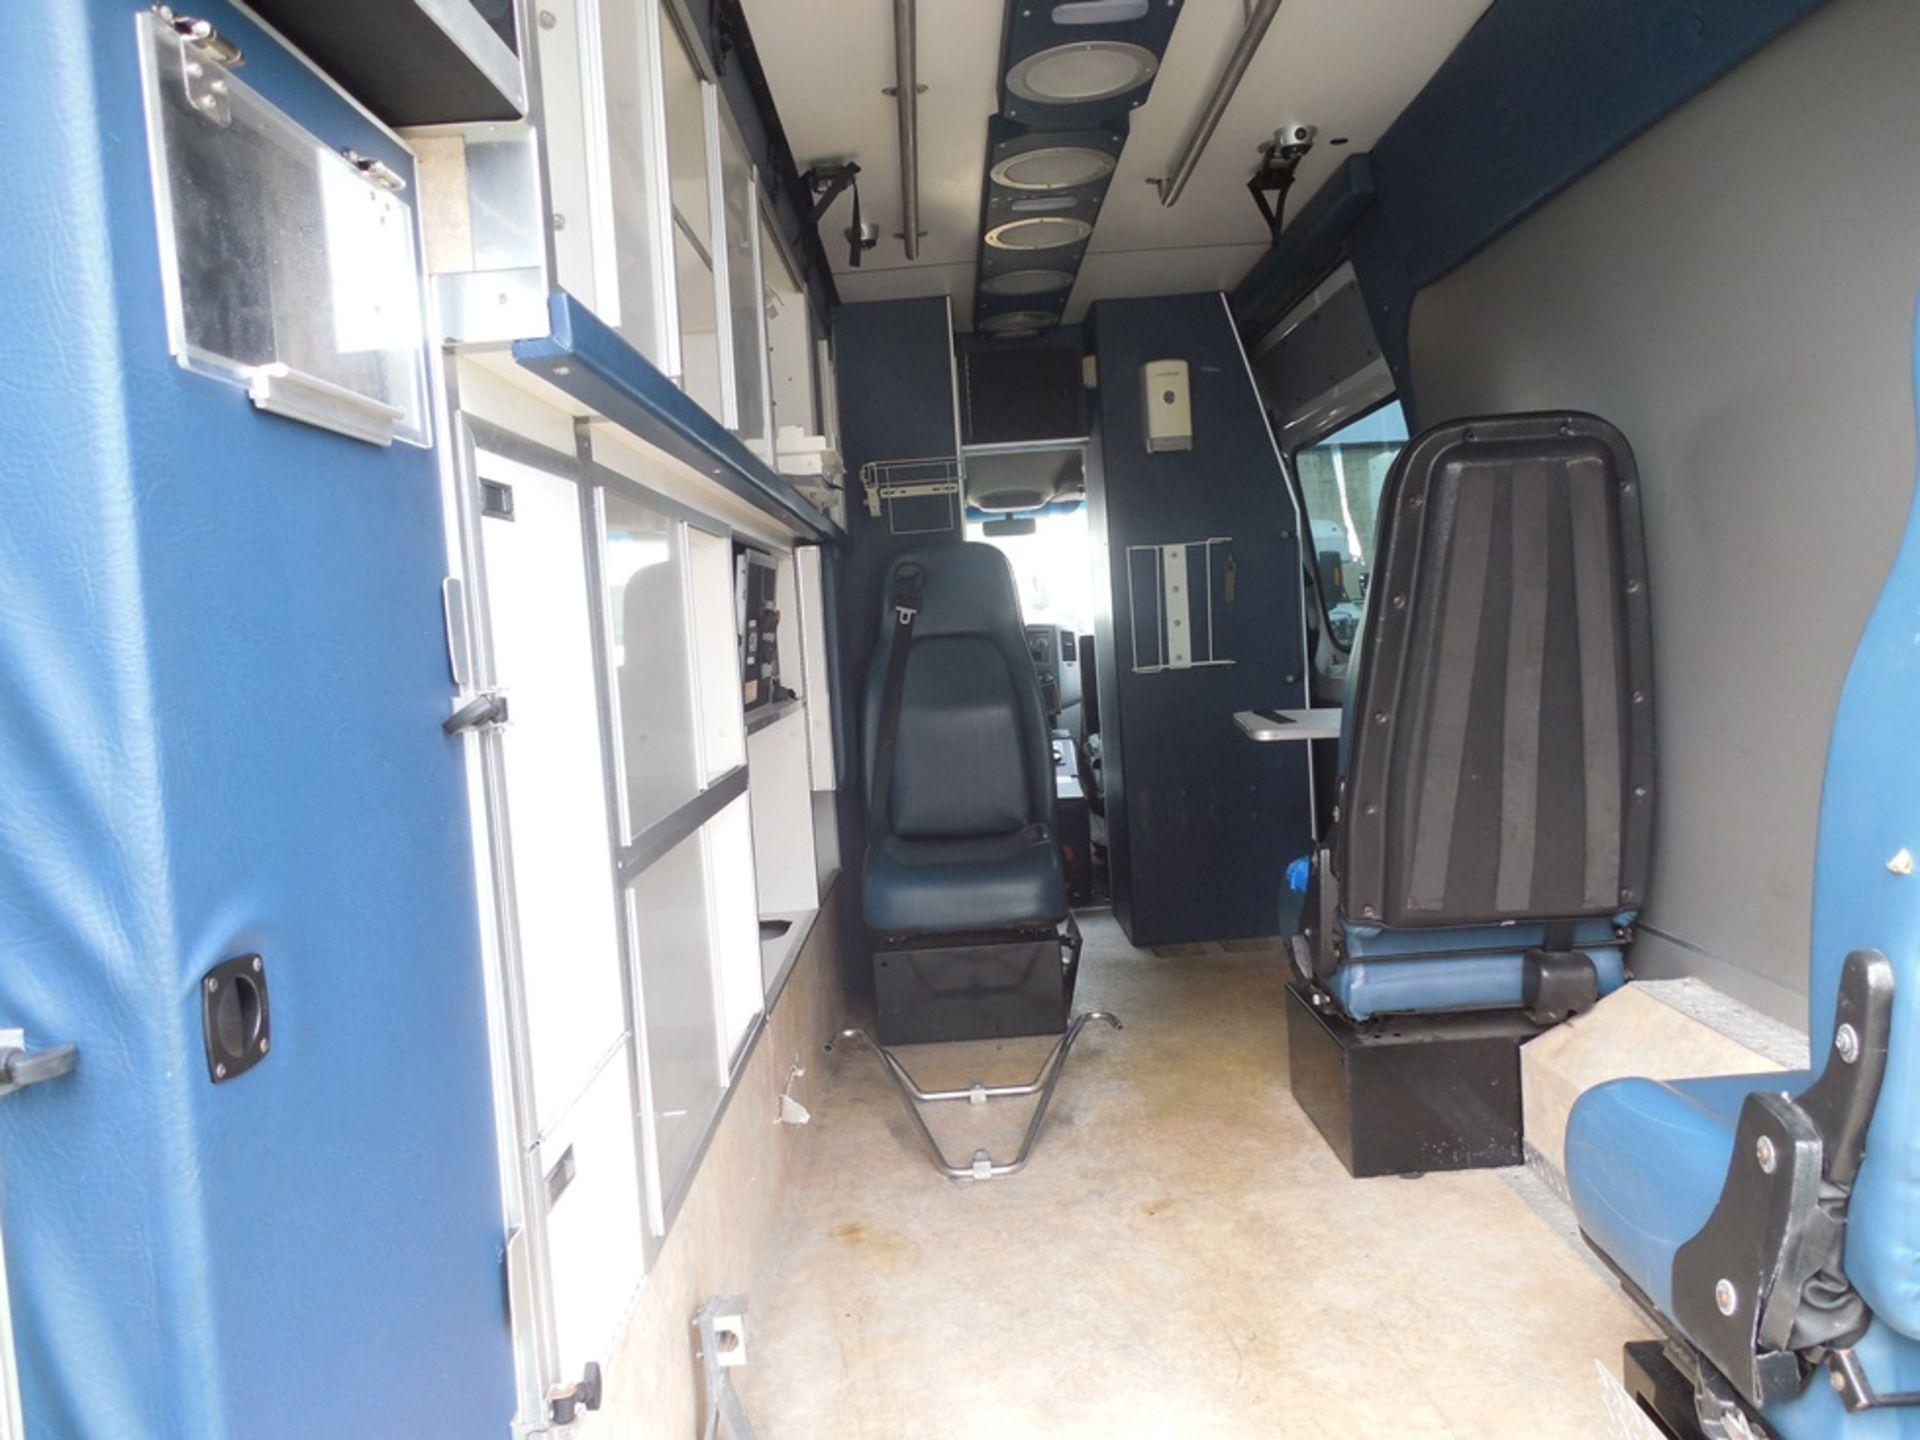 2011 Mercedes Sprinter dsl, ambulance 324,914 miles vin# WD3PE8CC6B5504105 - Image 6 of 6